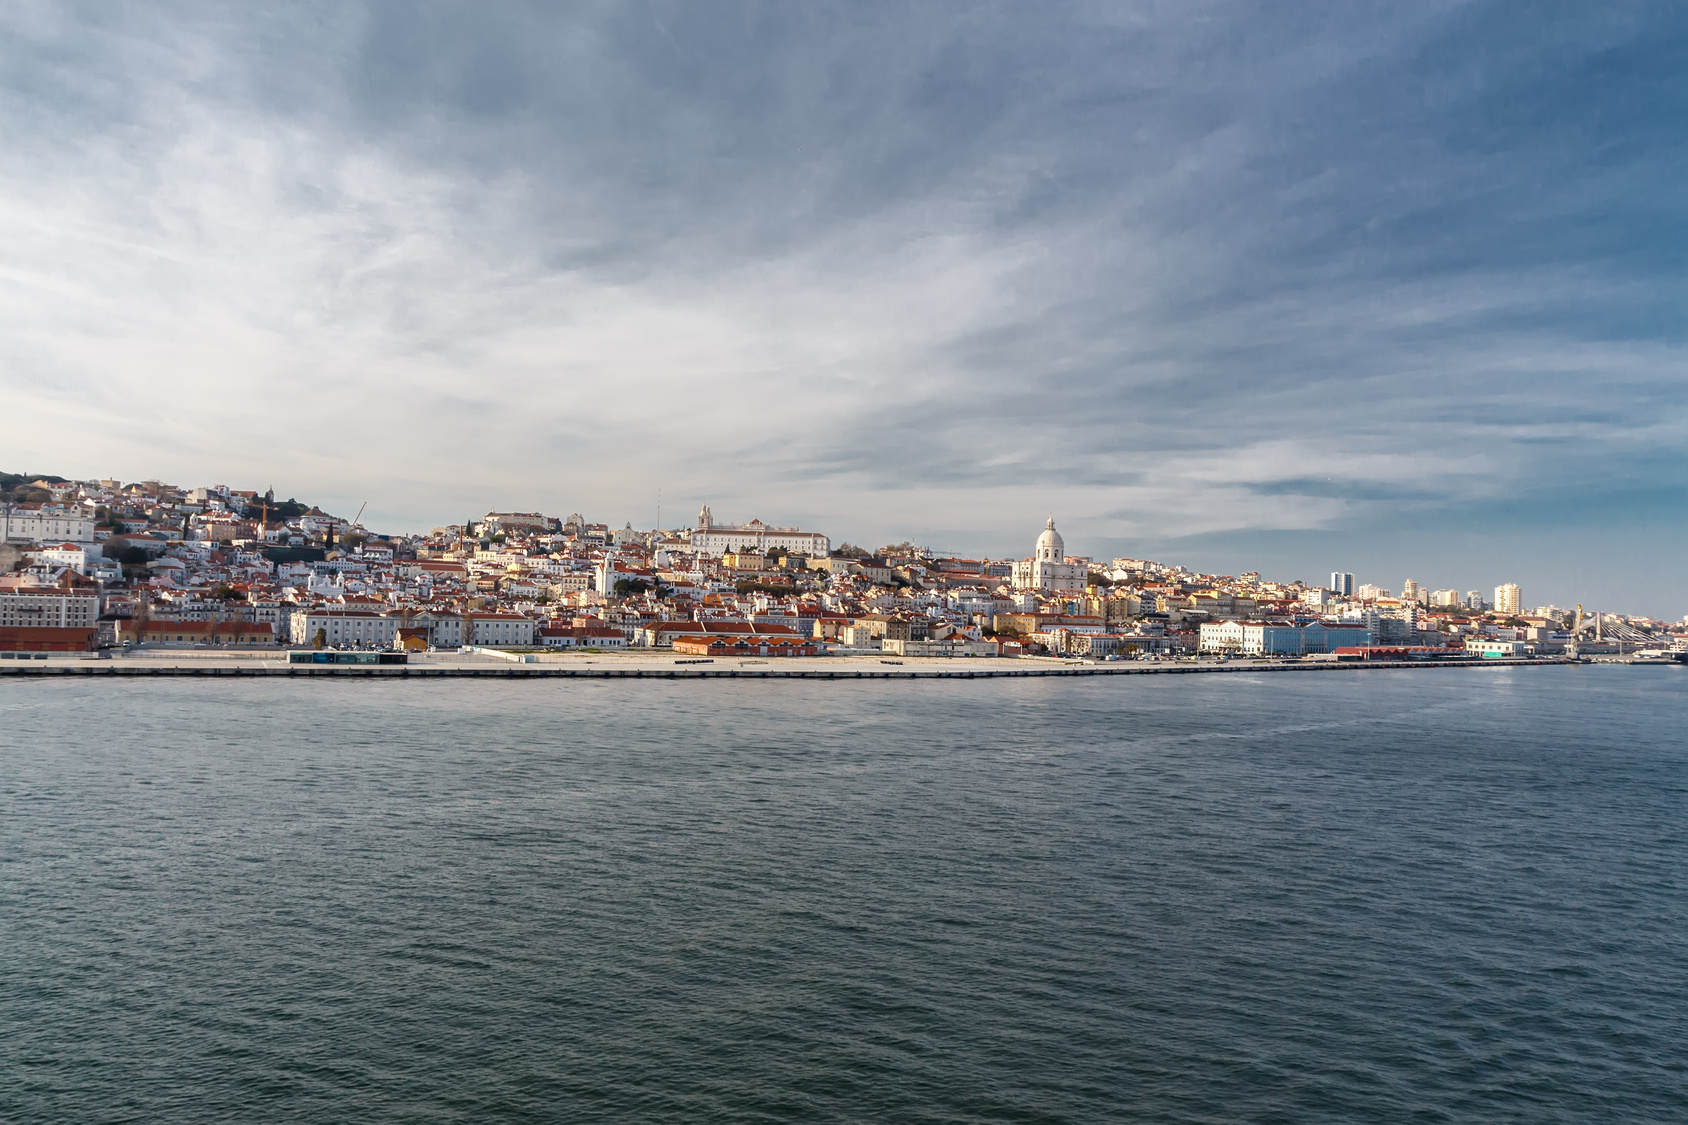 Portugal_Lisbon_travel_holidays_vacations_Lisboa_boat_river_view_Baixa_Alfama.jp